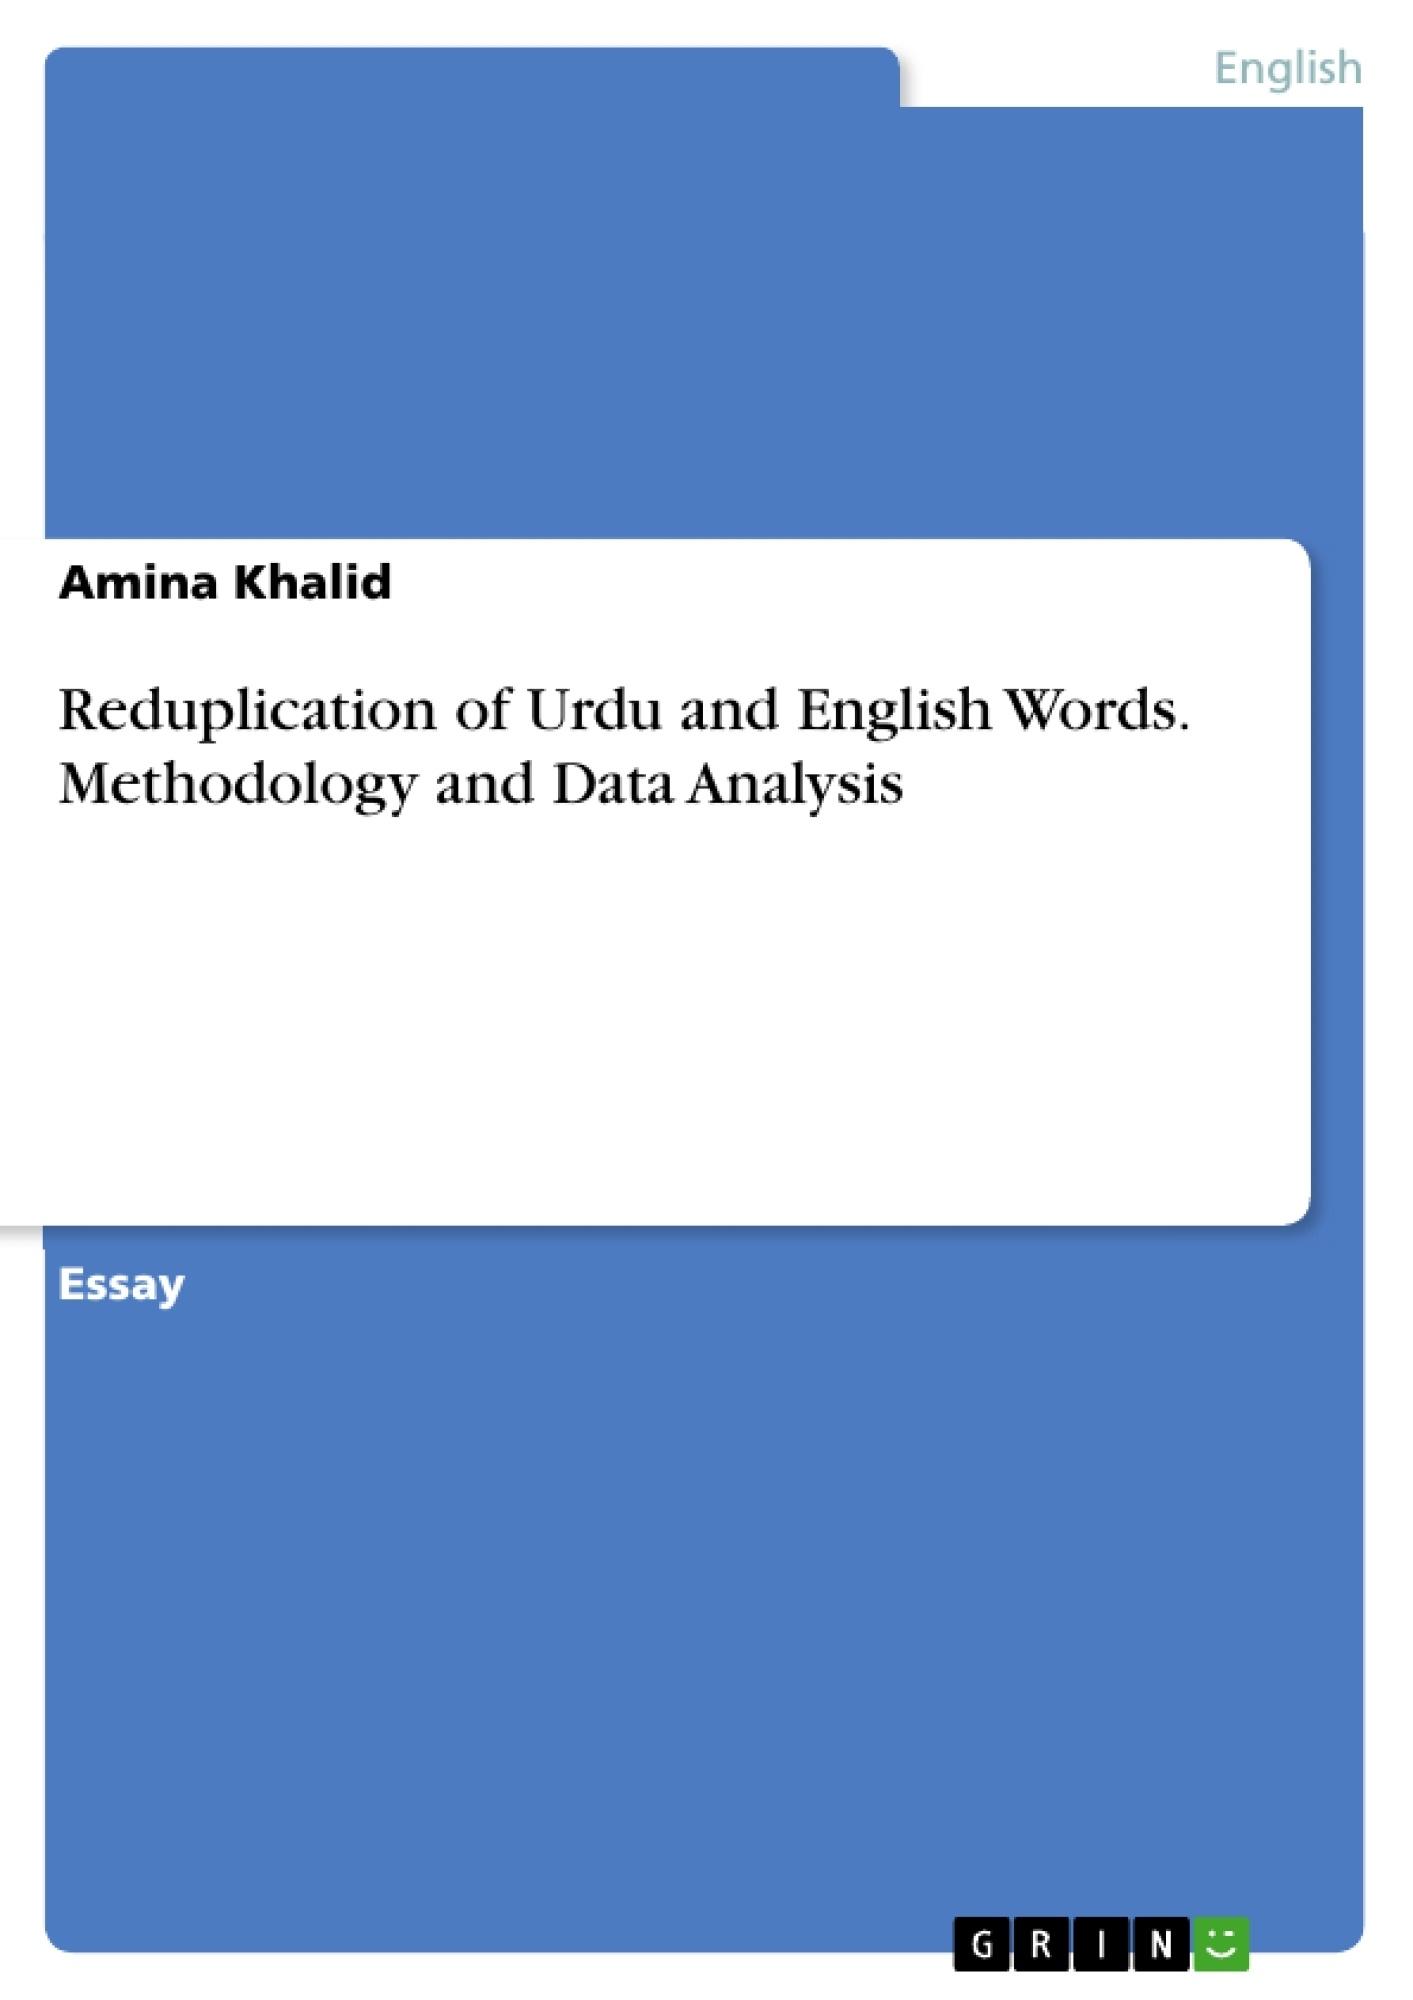 Title: Reduplication of Urdu and English Words. Methodology and Data Analysis